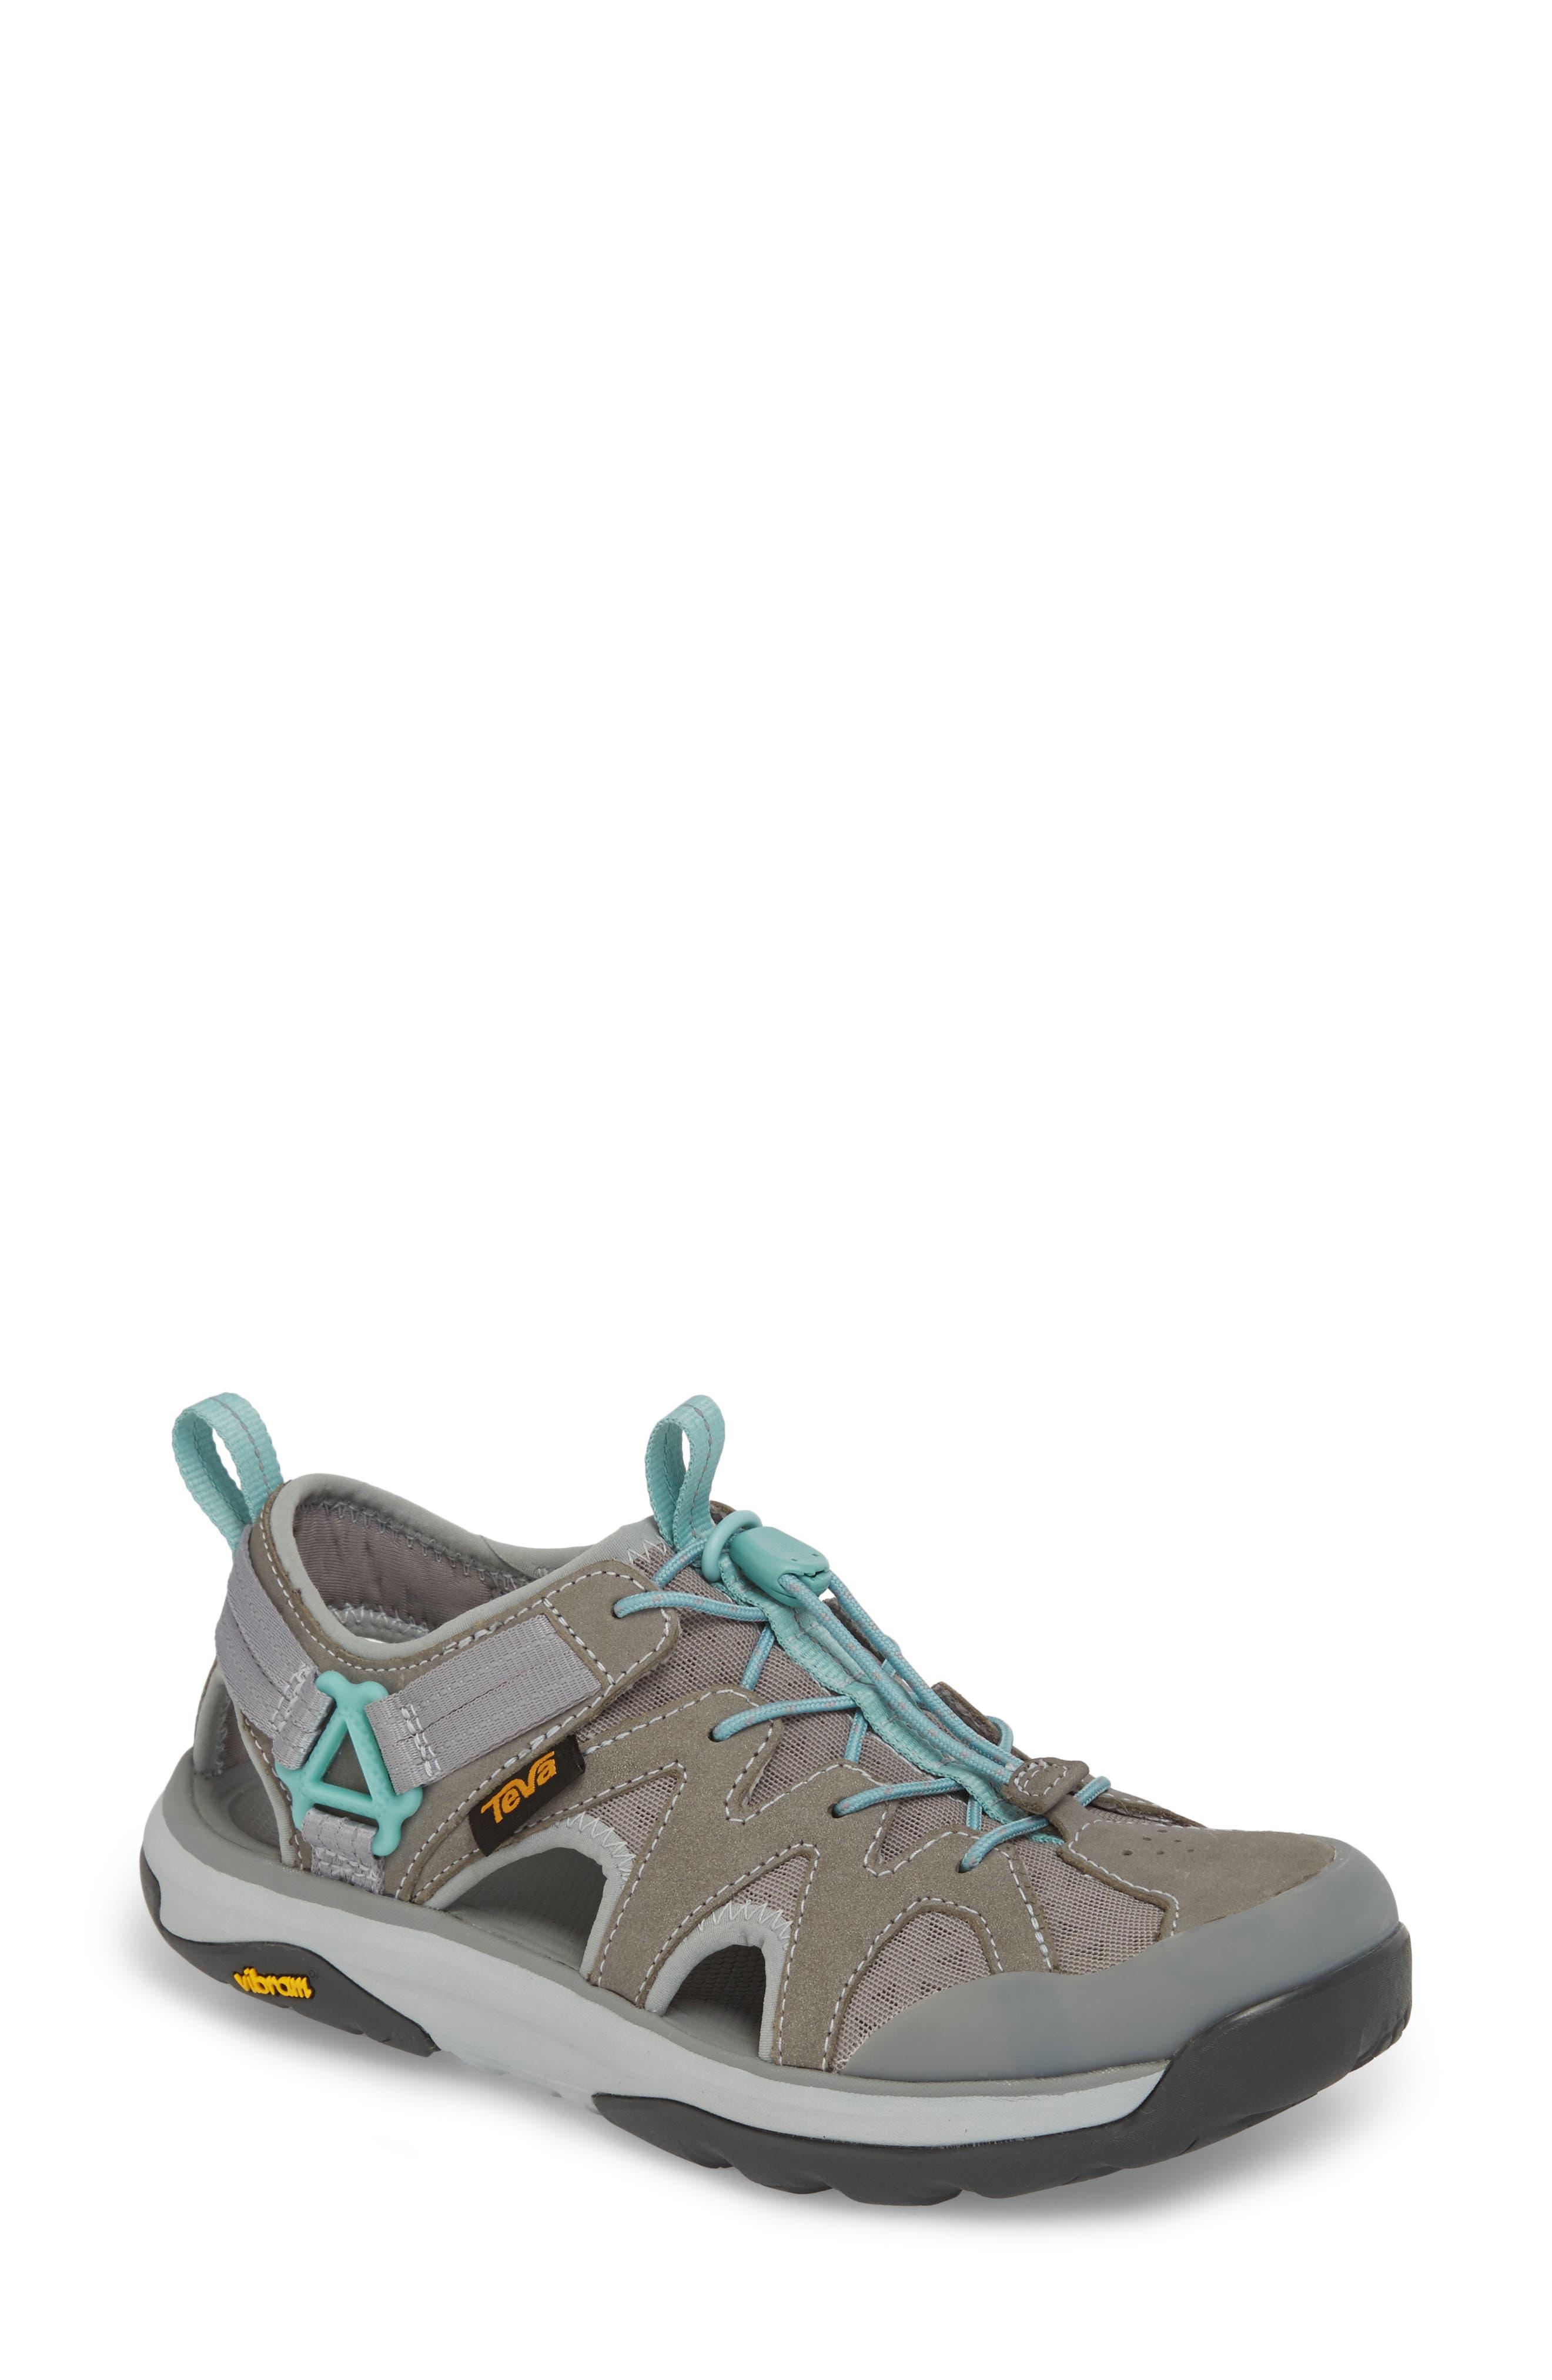 Terra Float Active Sandal,                             Main thumbnail 2, color,